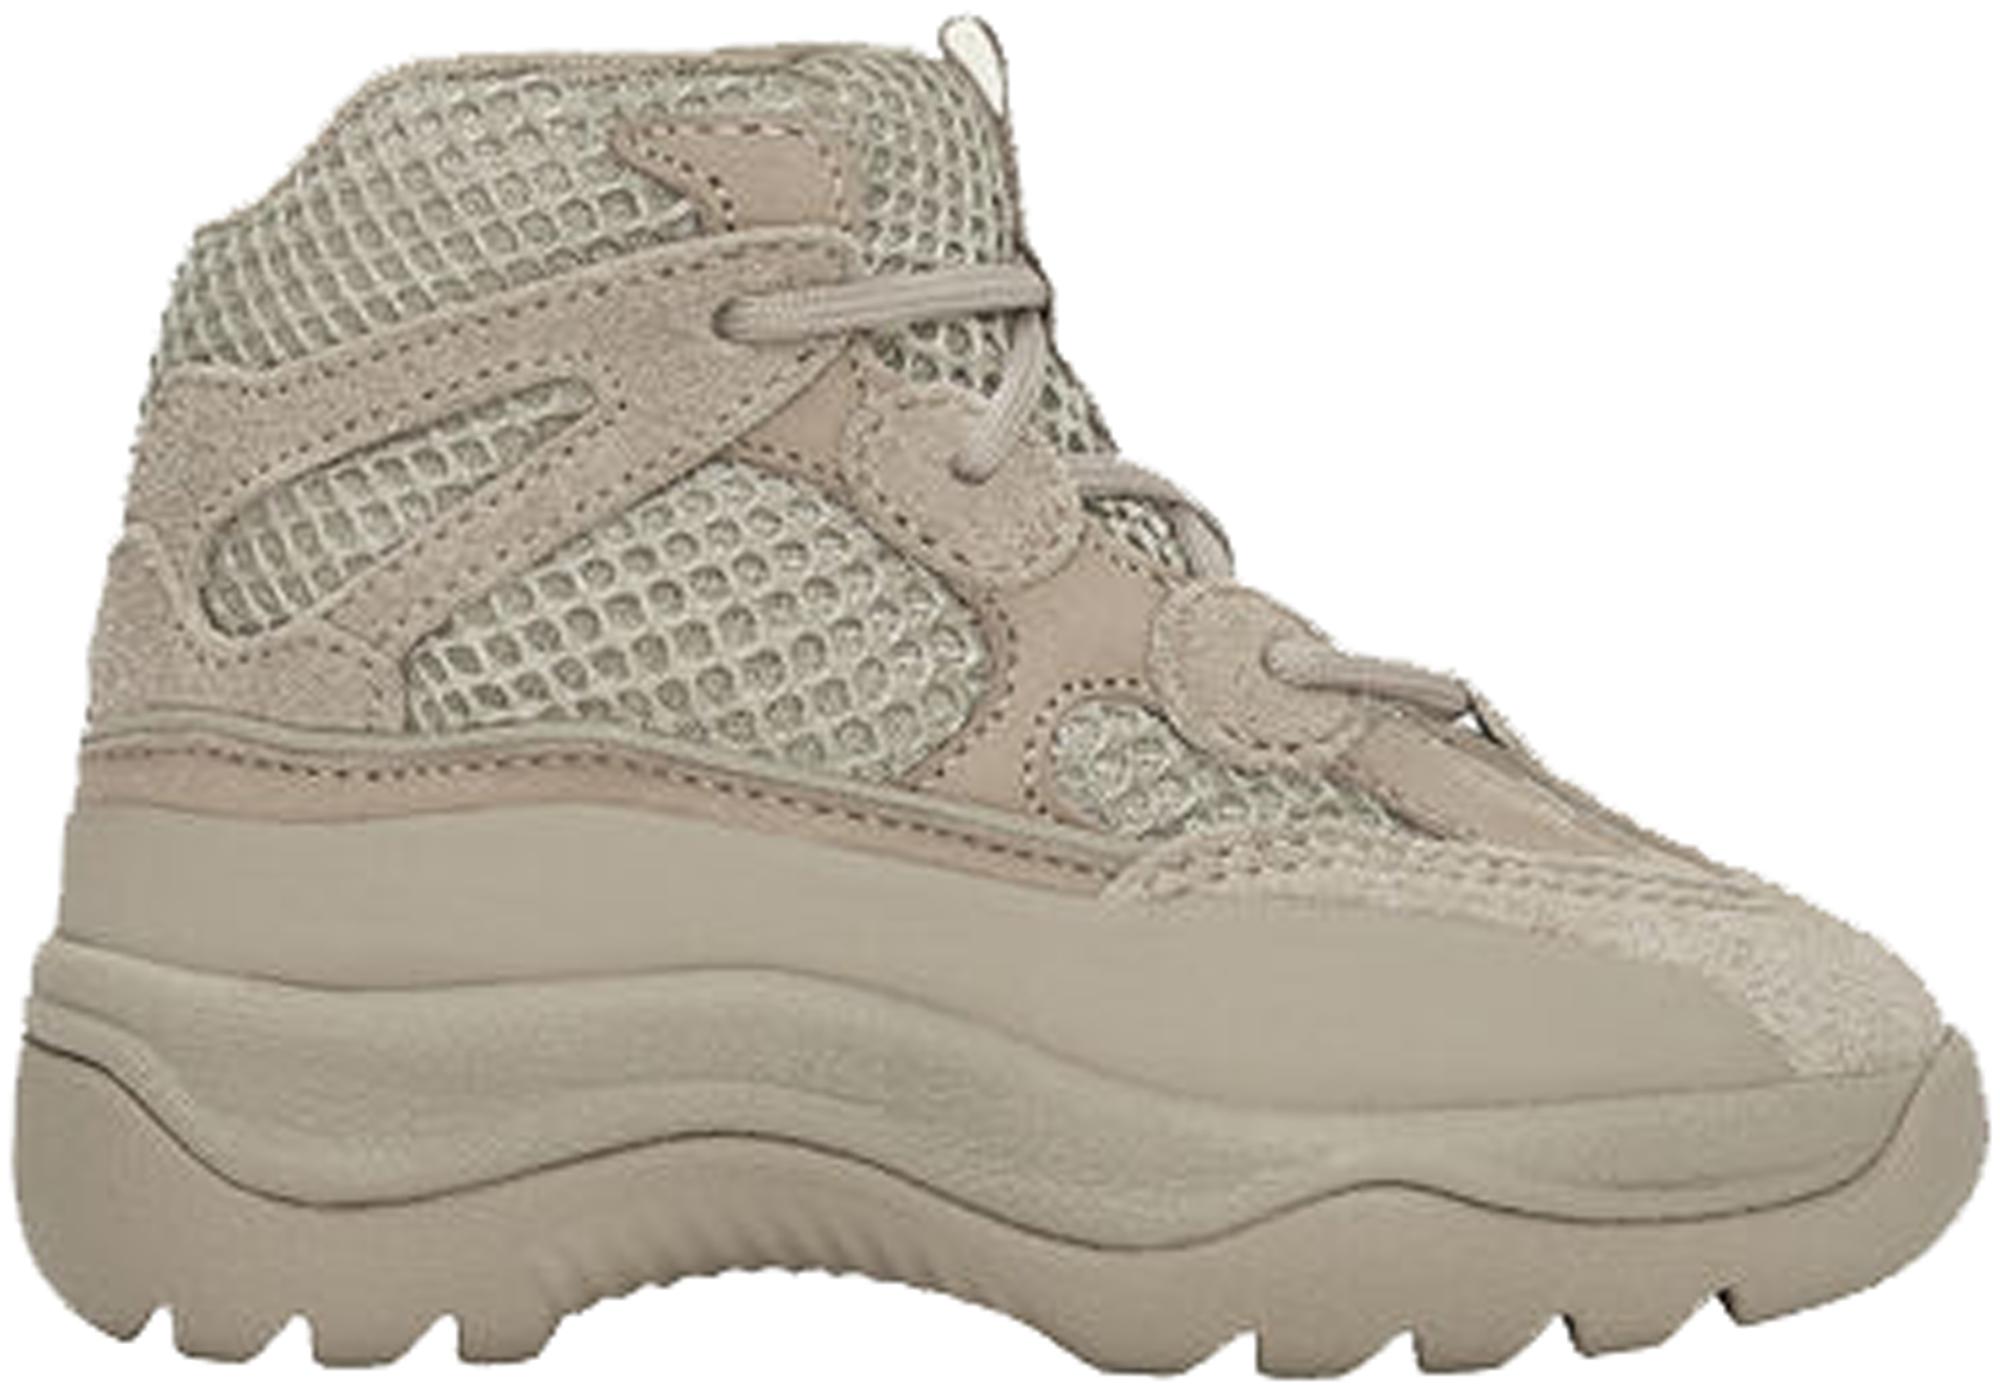 adidas Yeezy Desert Boot Rock (Infant